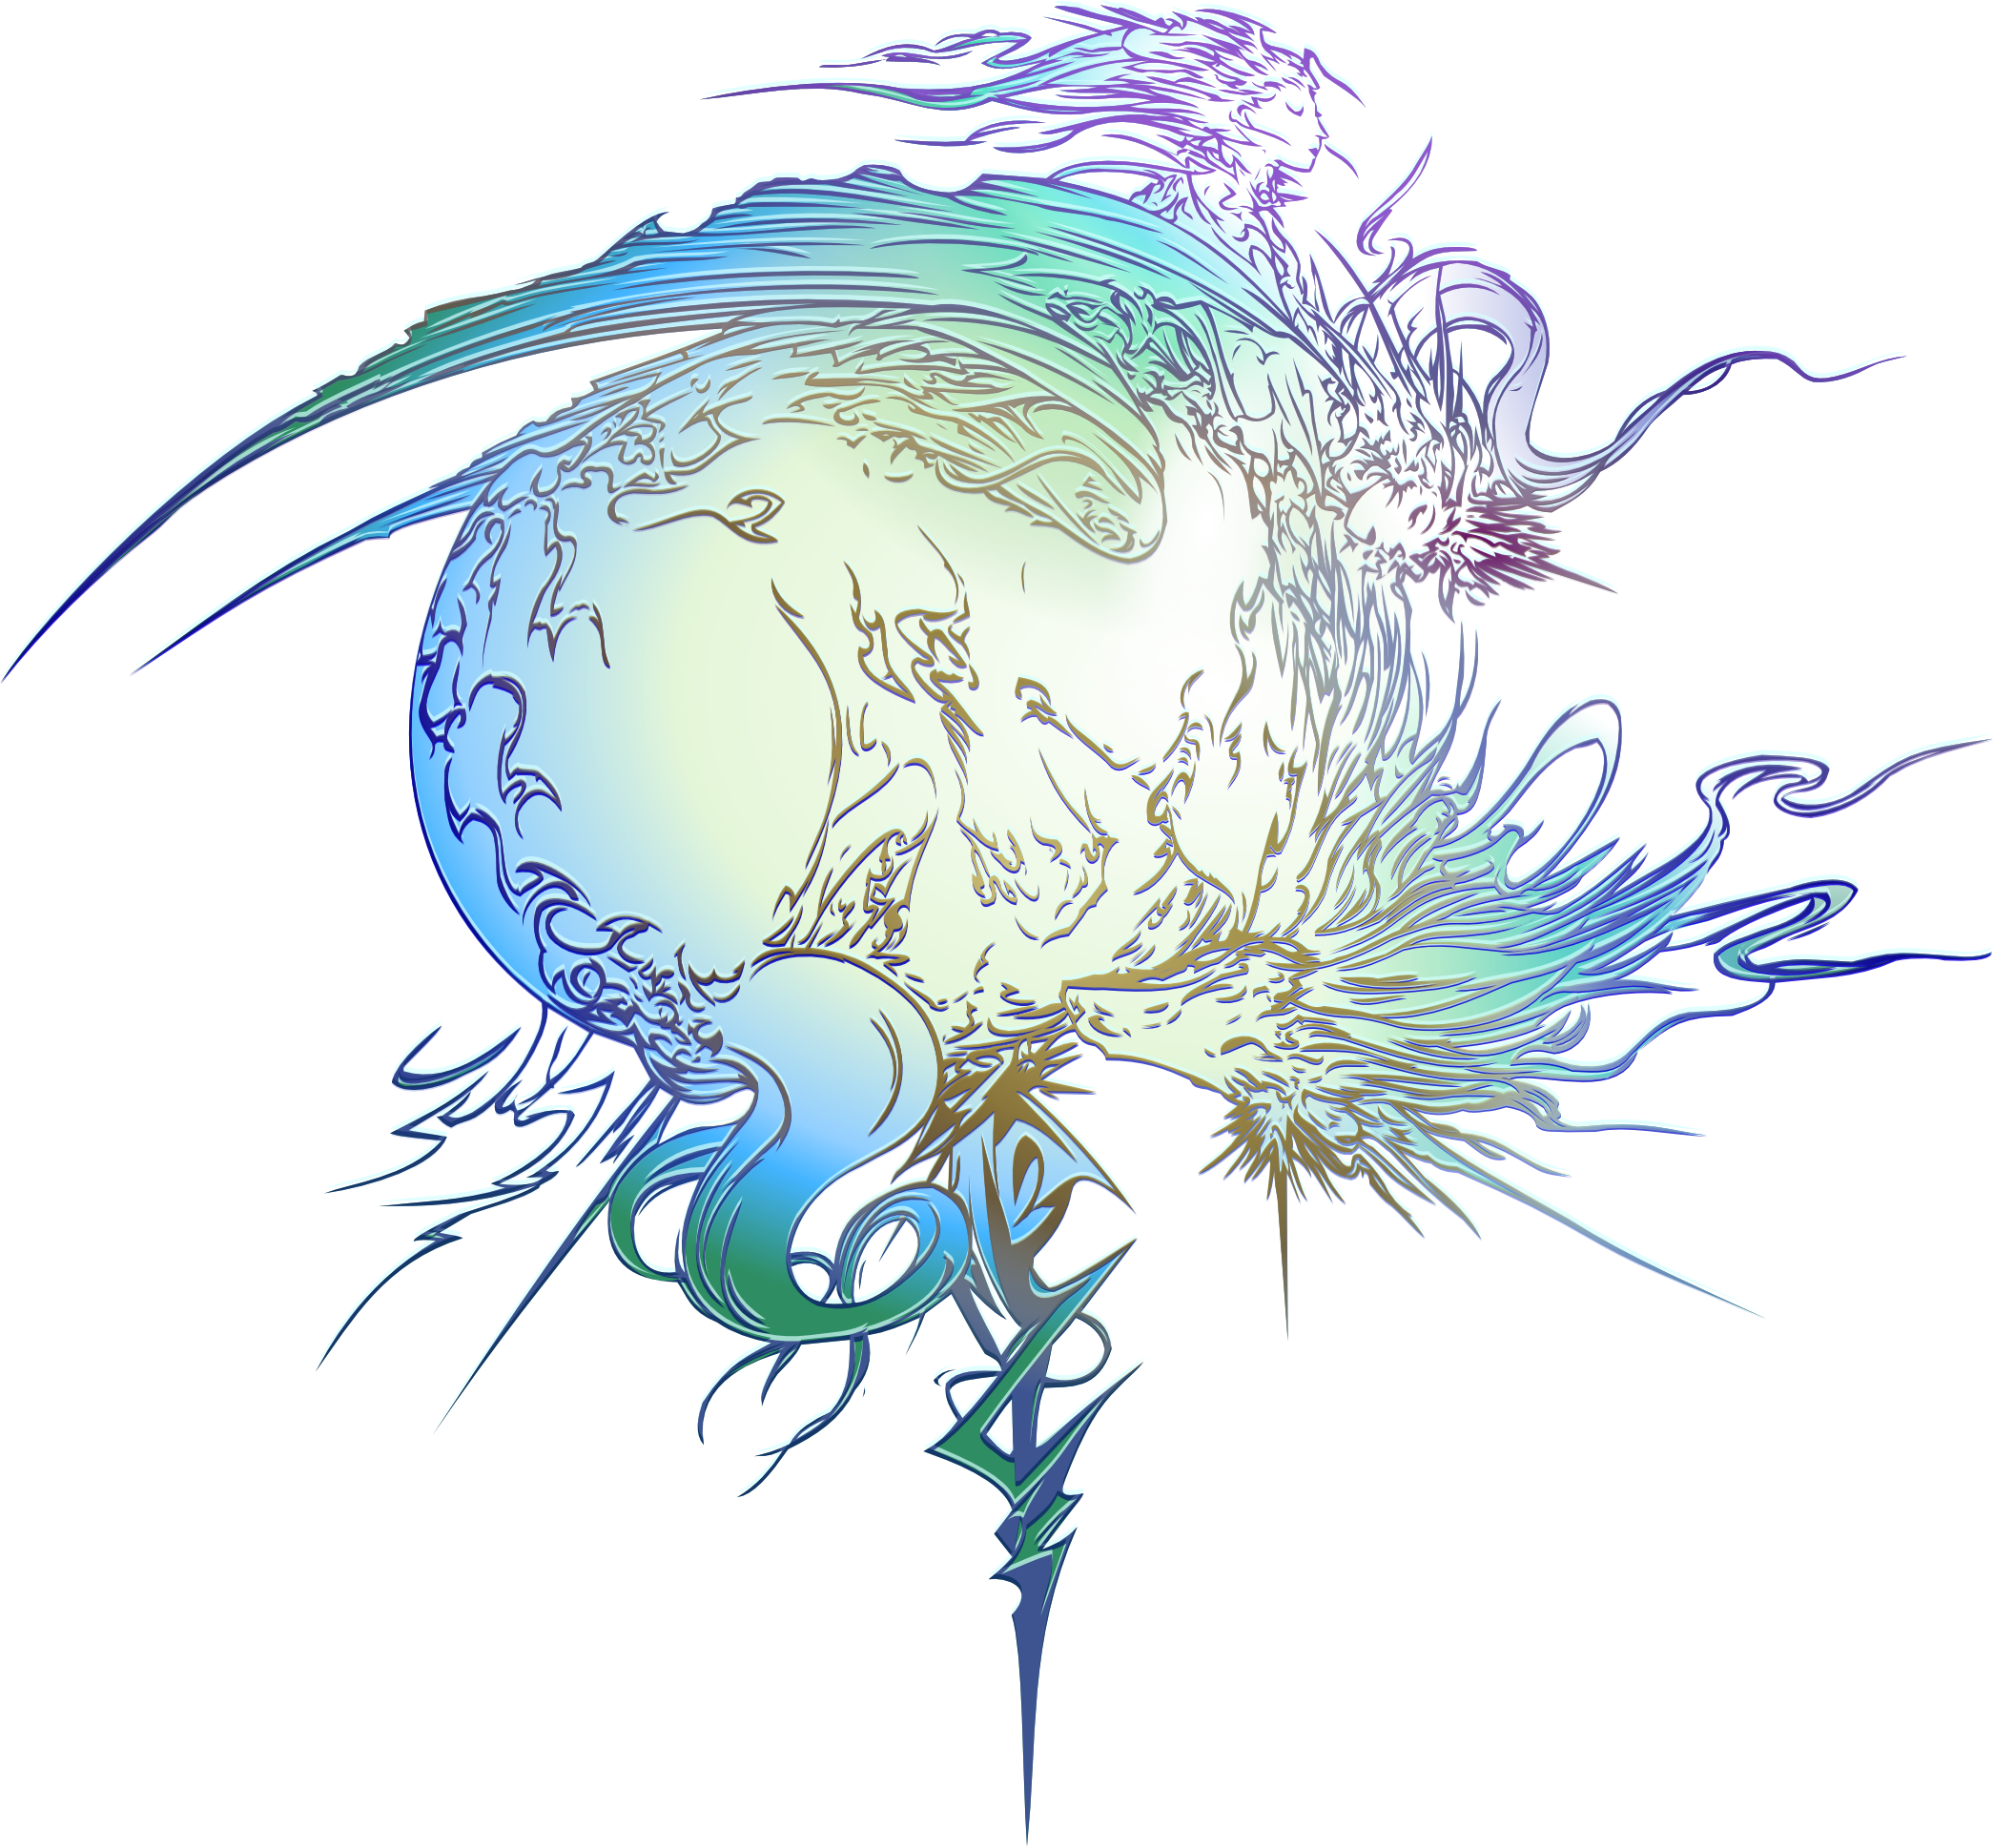 final fantasy xiii logo by eldi13 on deviantart